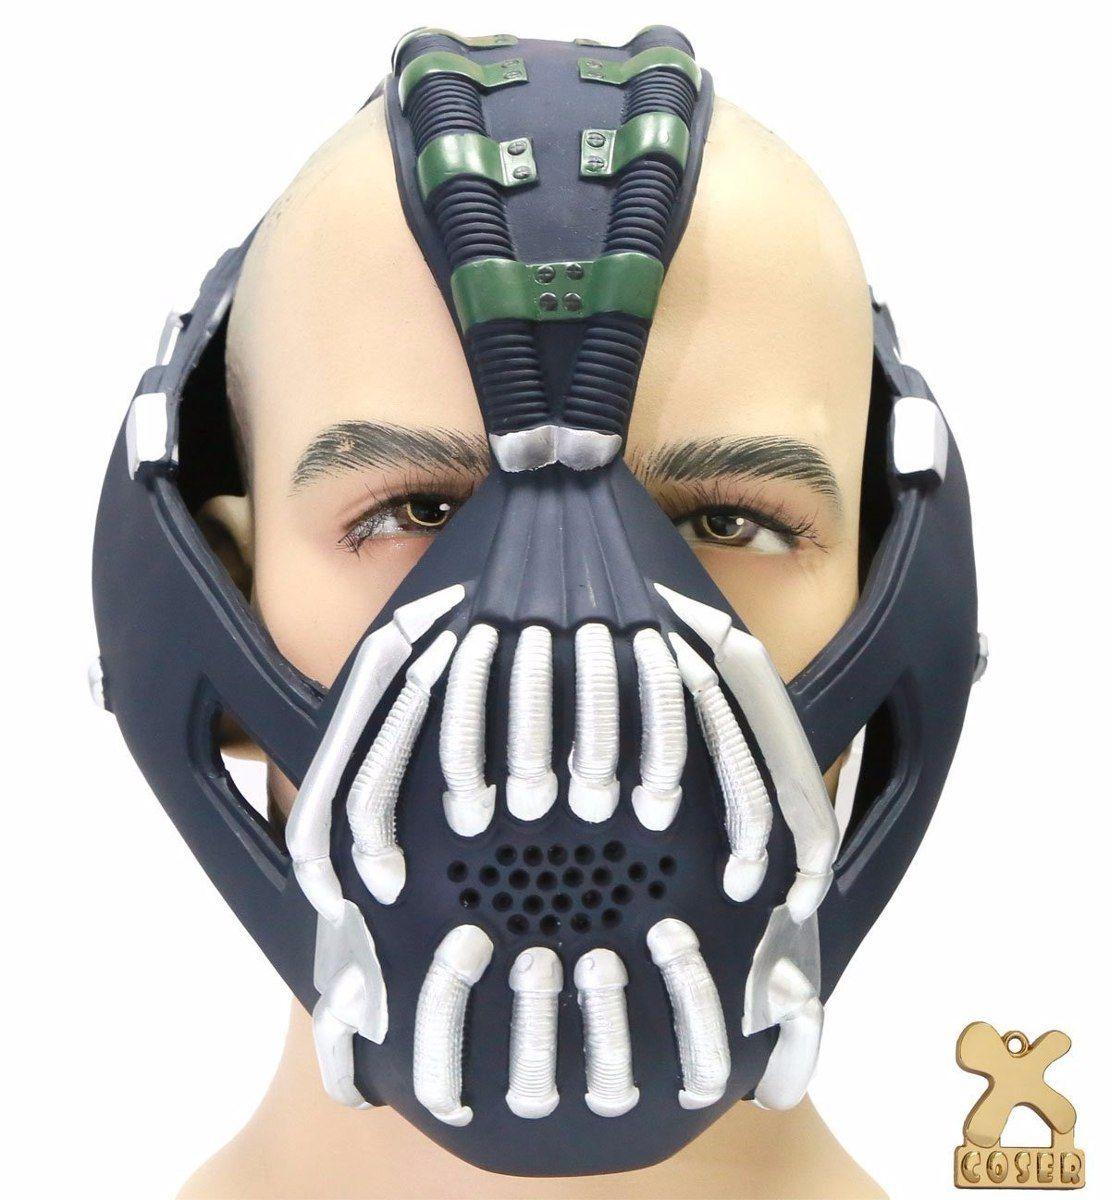 Mascara Bozal Bane Deluxe Ultima Version. Batman. Modelos ...